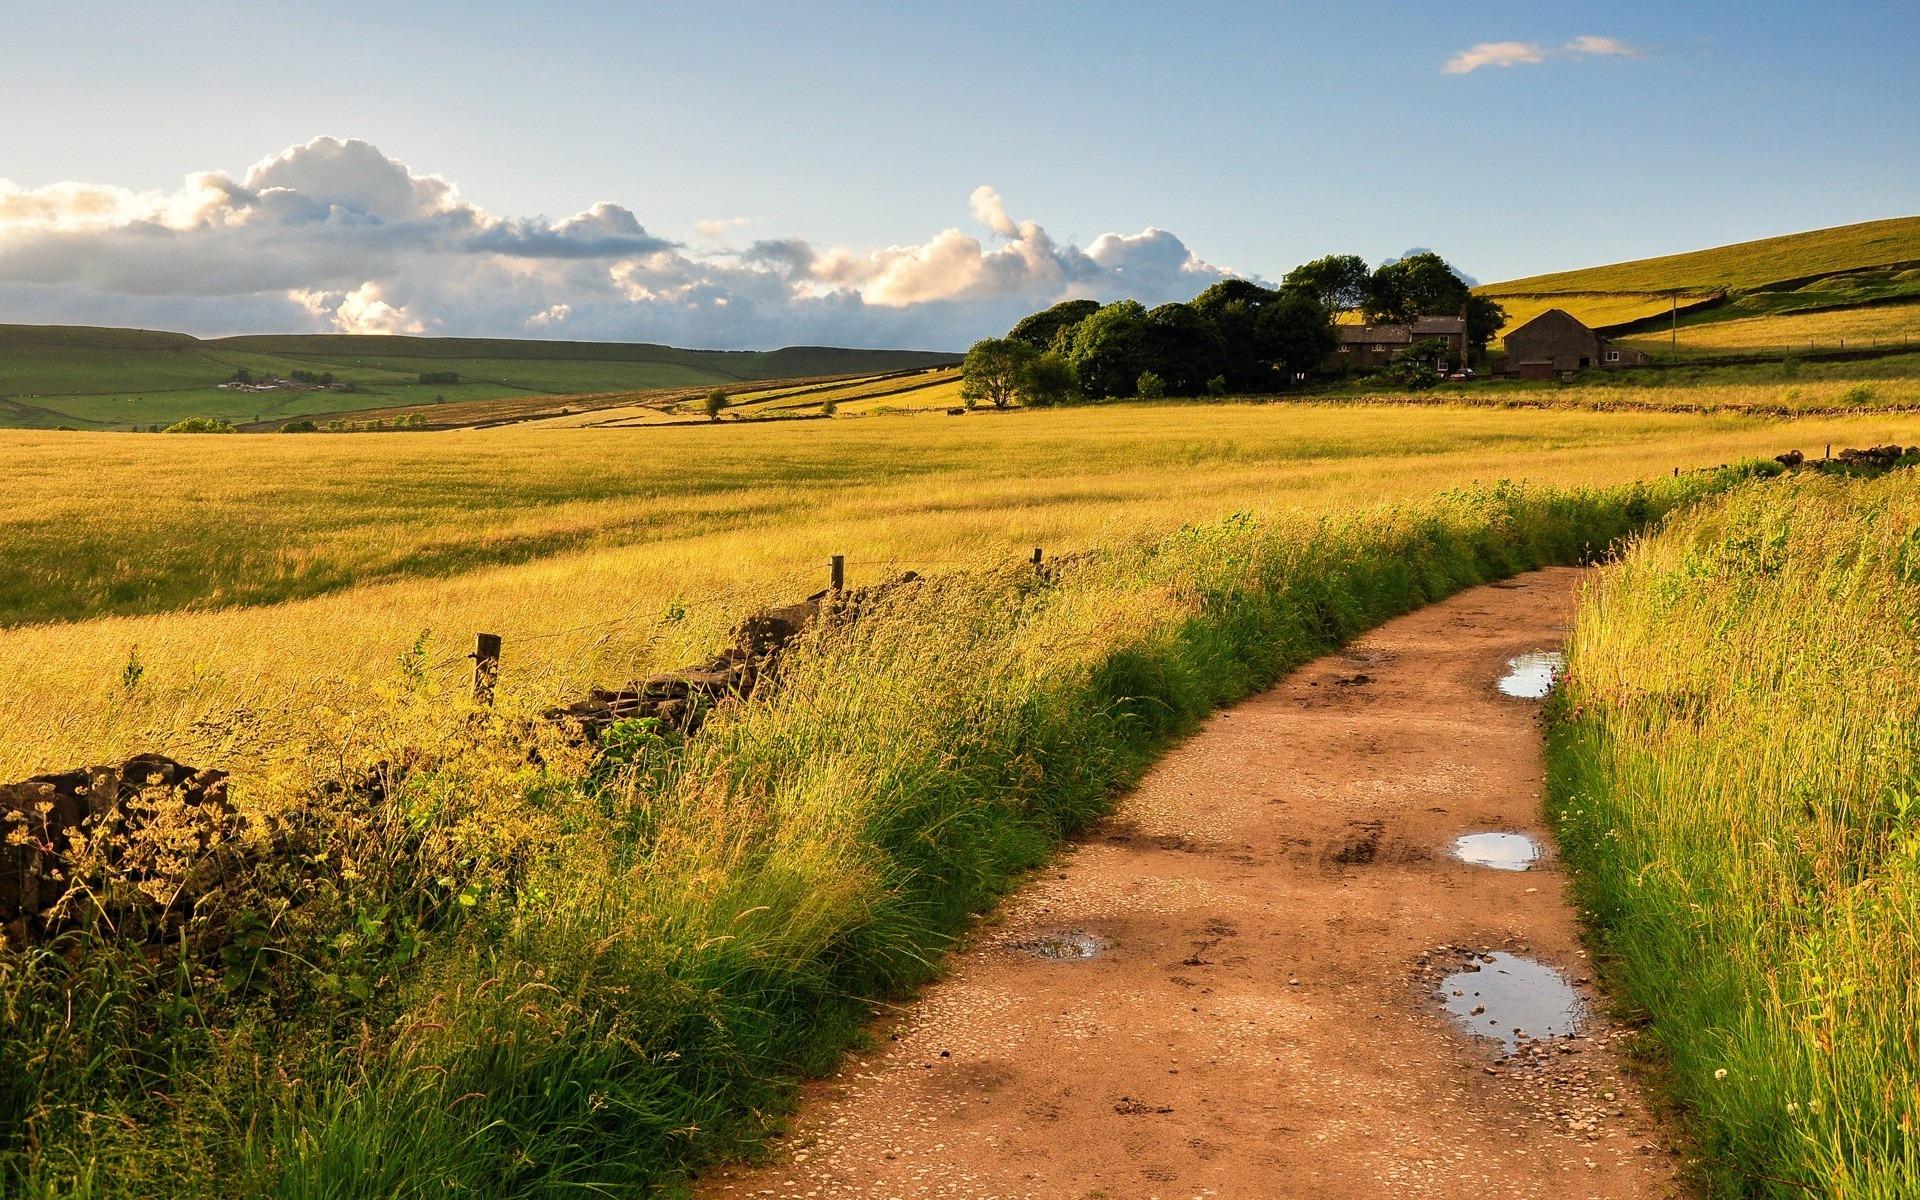 European Auto House >> countryside road-landscape HD photo Wallpaper Preview | 10wallpaper.com